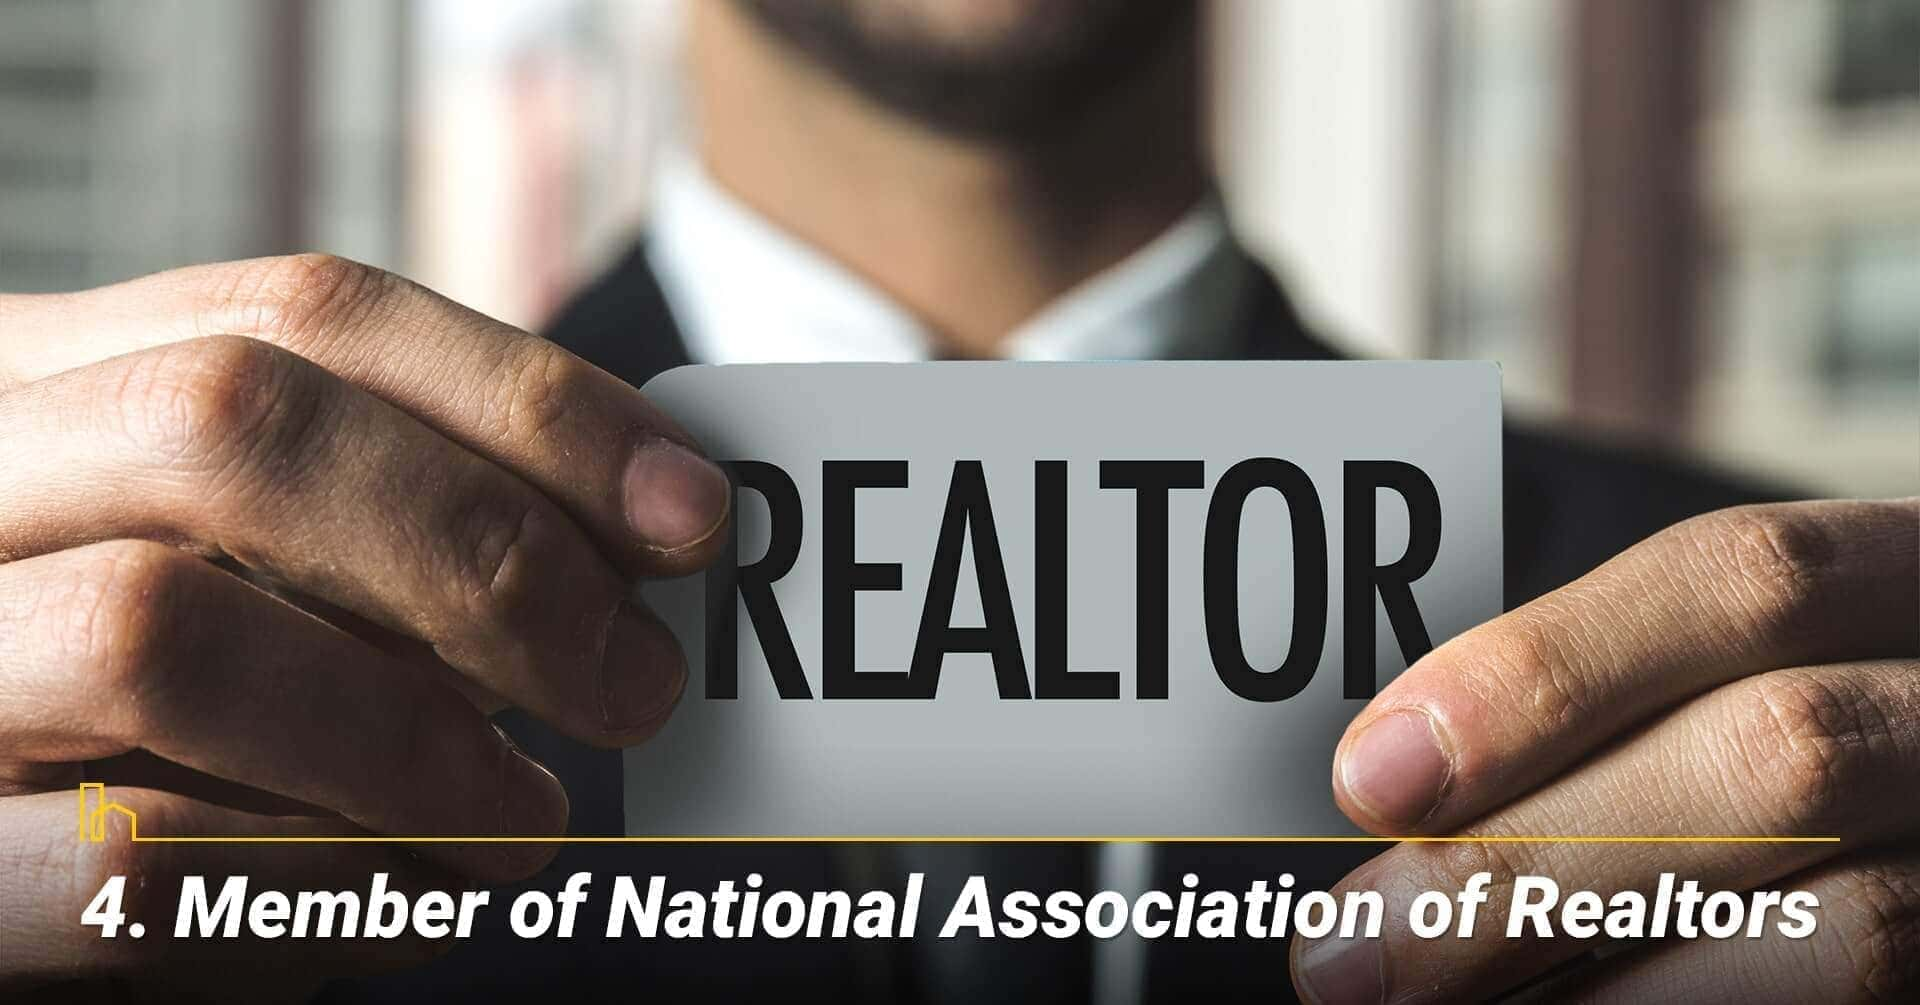 Member of National Association of Realtors, being a member of highly regard associations